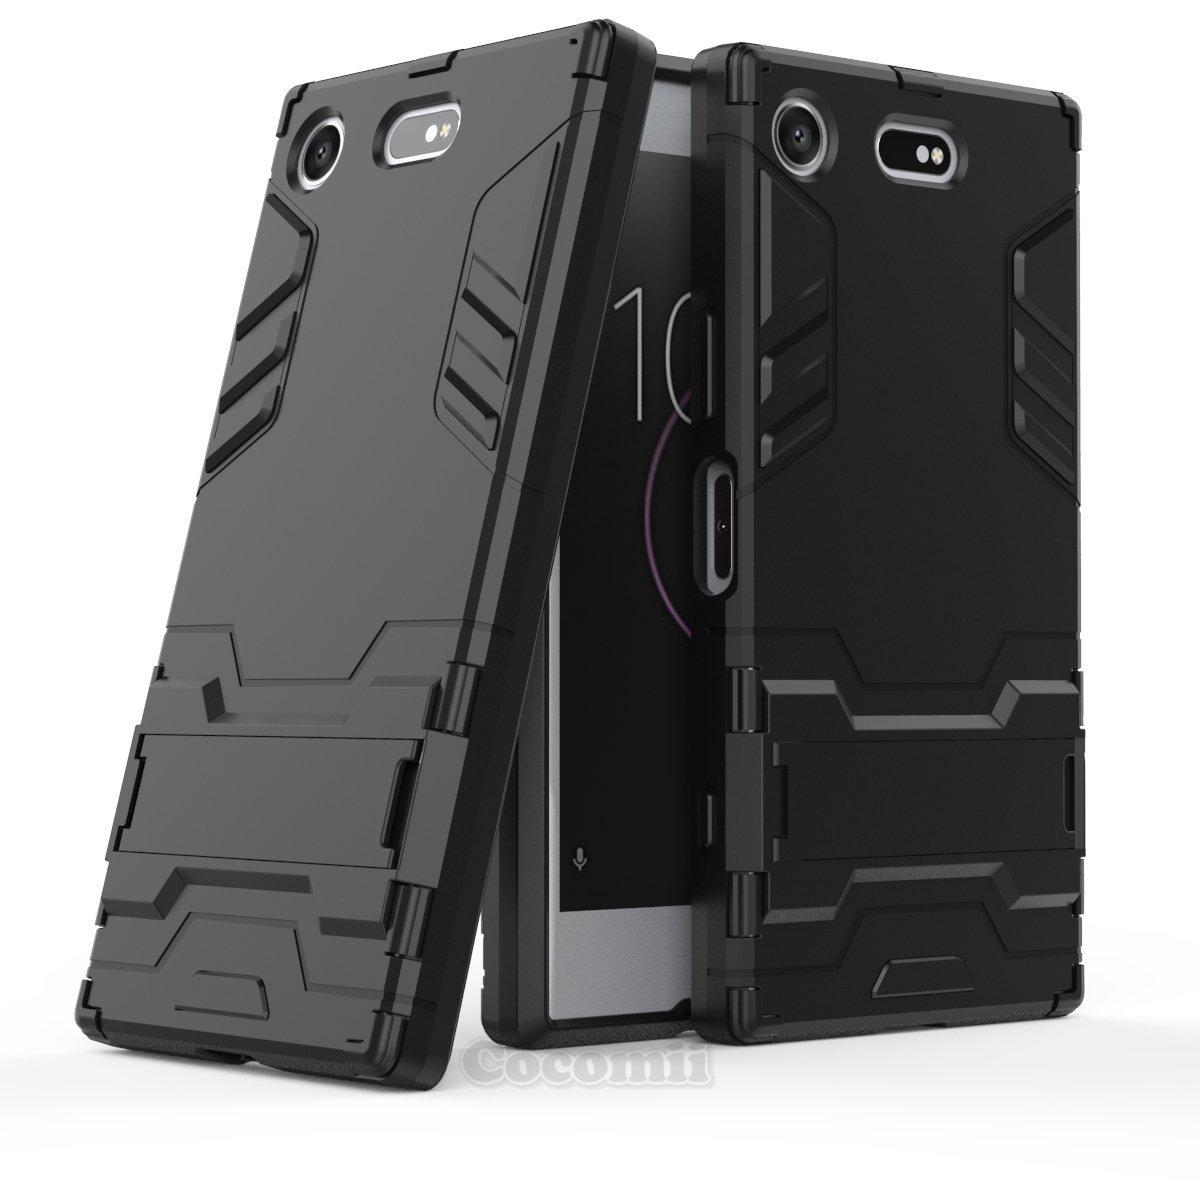 Cocomii Iron Man Armor Sony Xperia XZ1 Compact